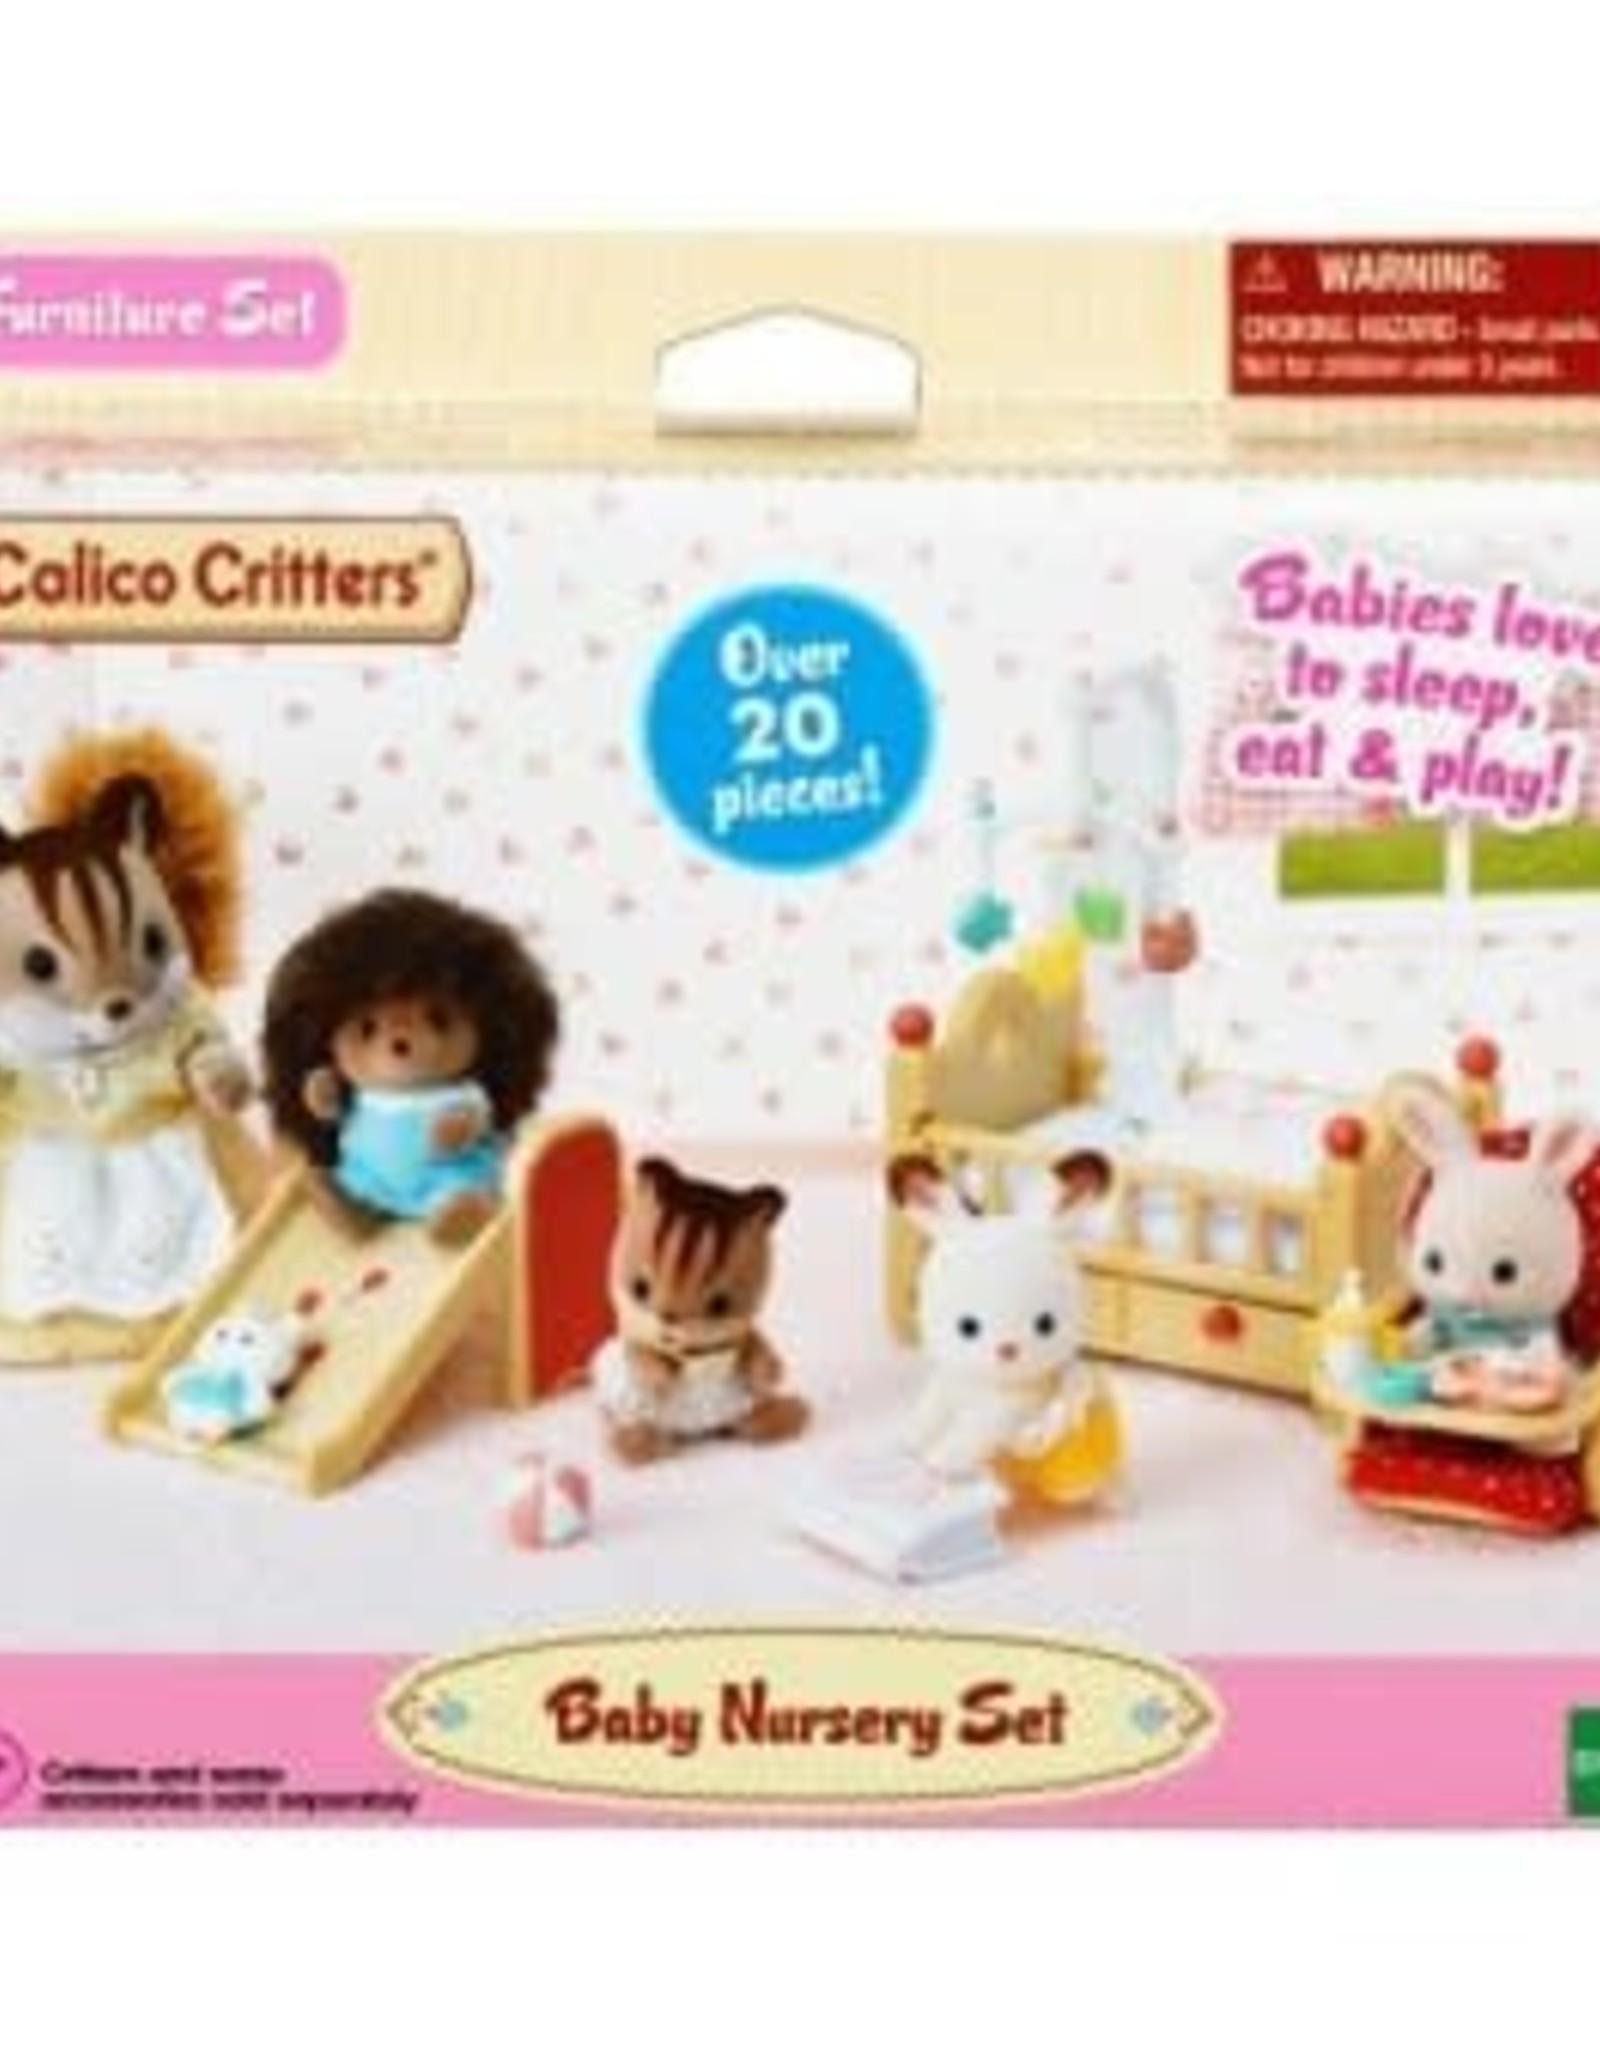 Calico Critters Baby Nursery